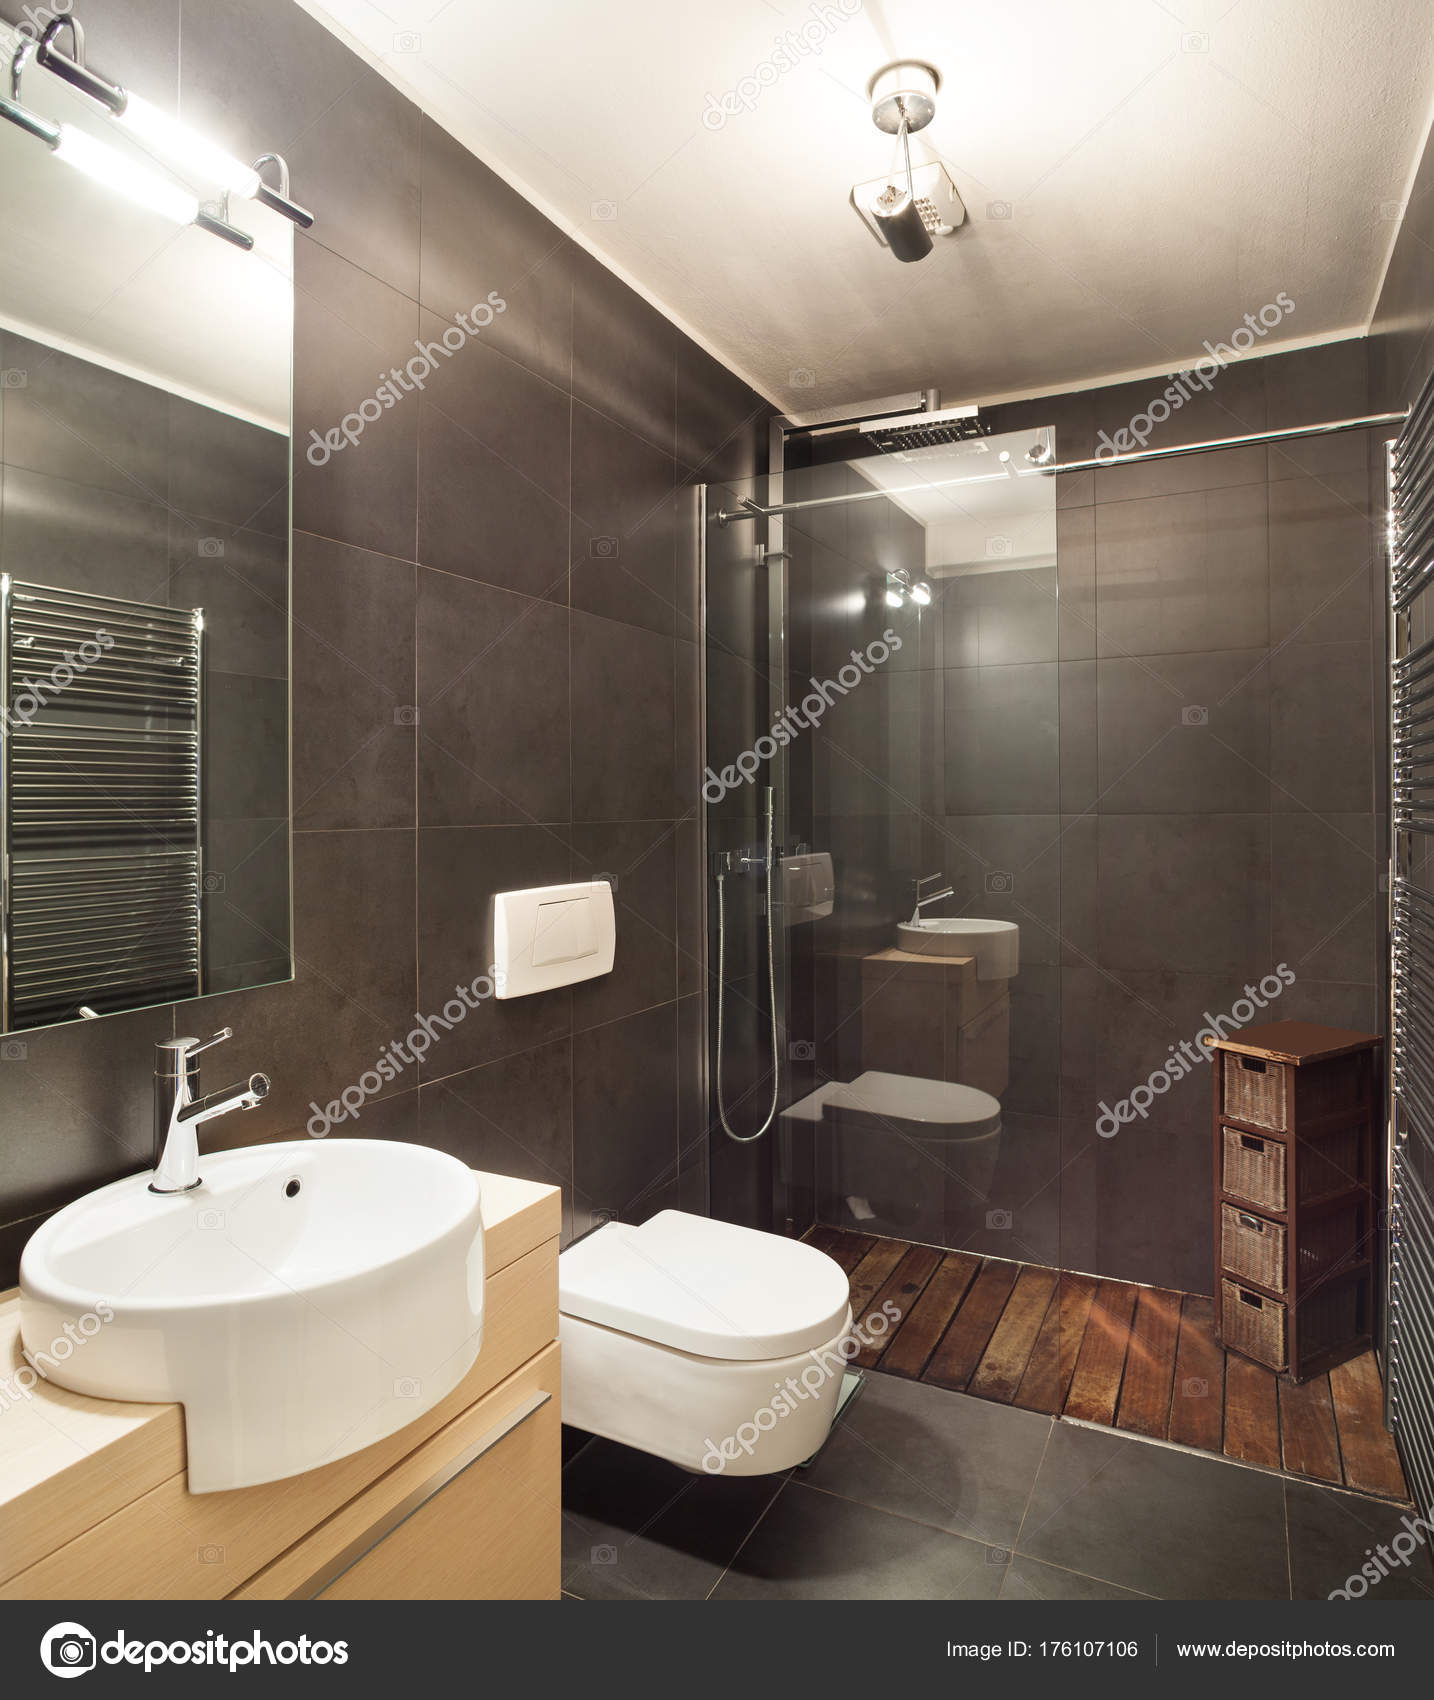 Casa moderna bagno buio foto stock zveiger 176107106 for Casa moderna immagini